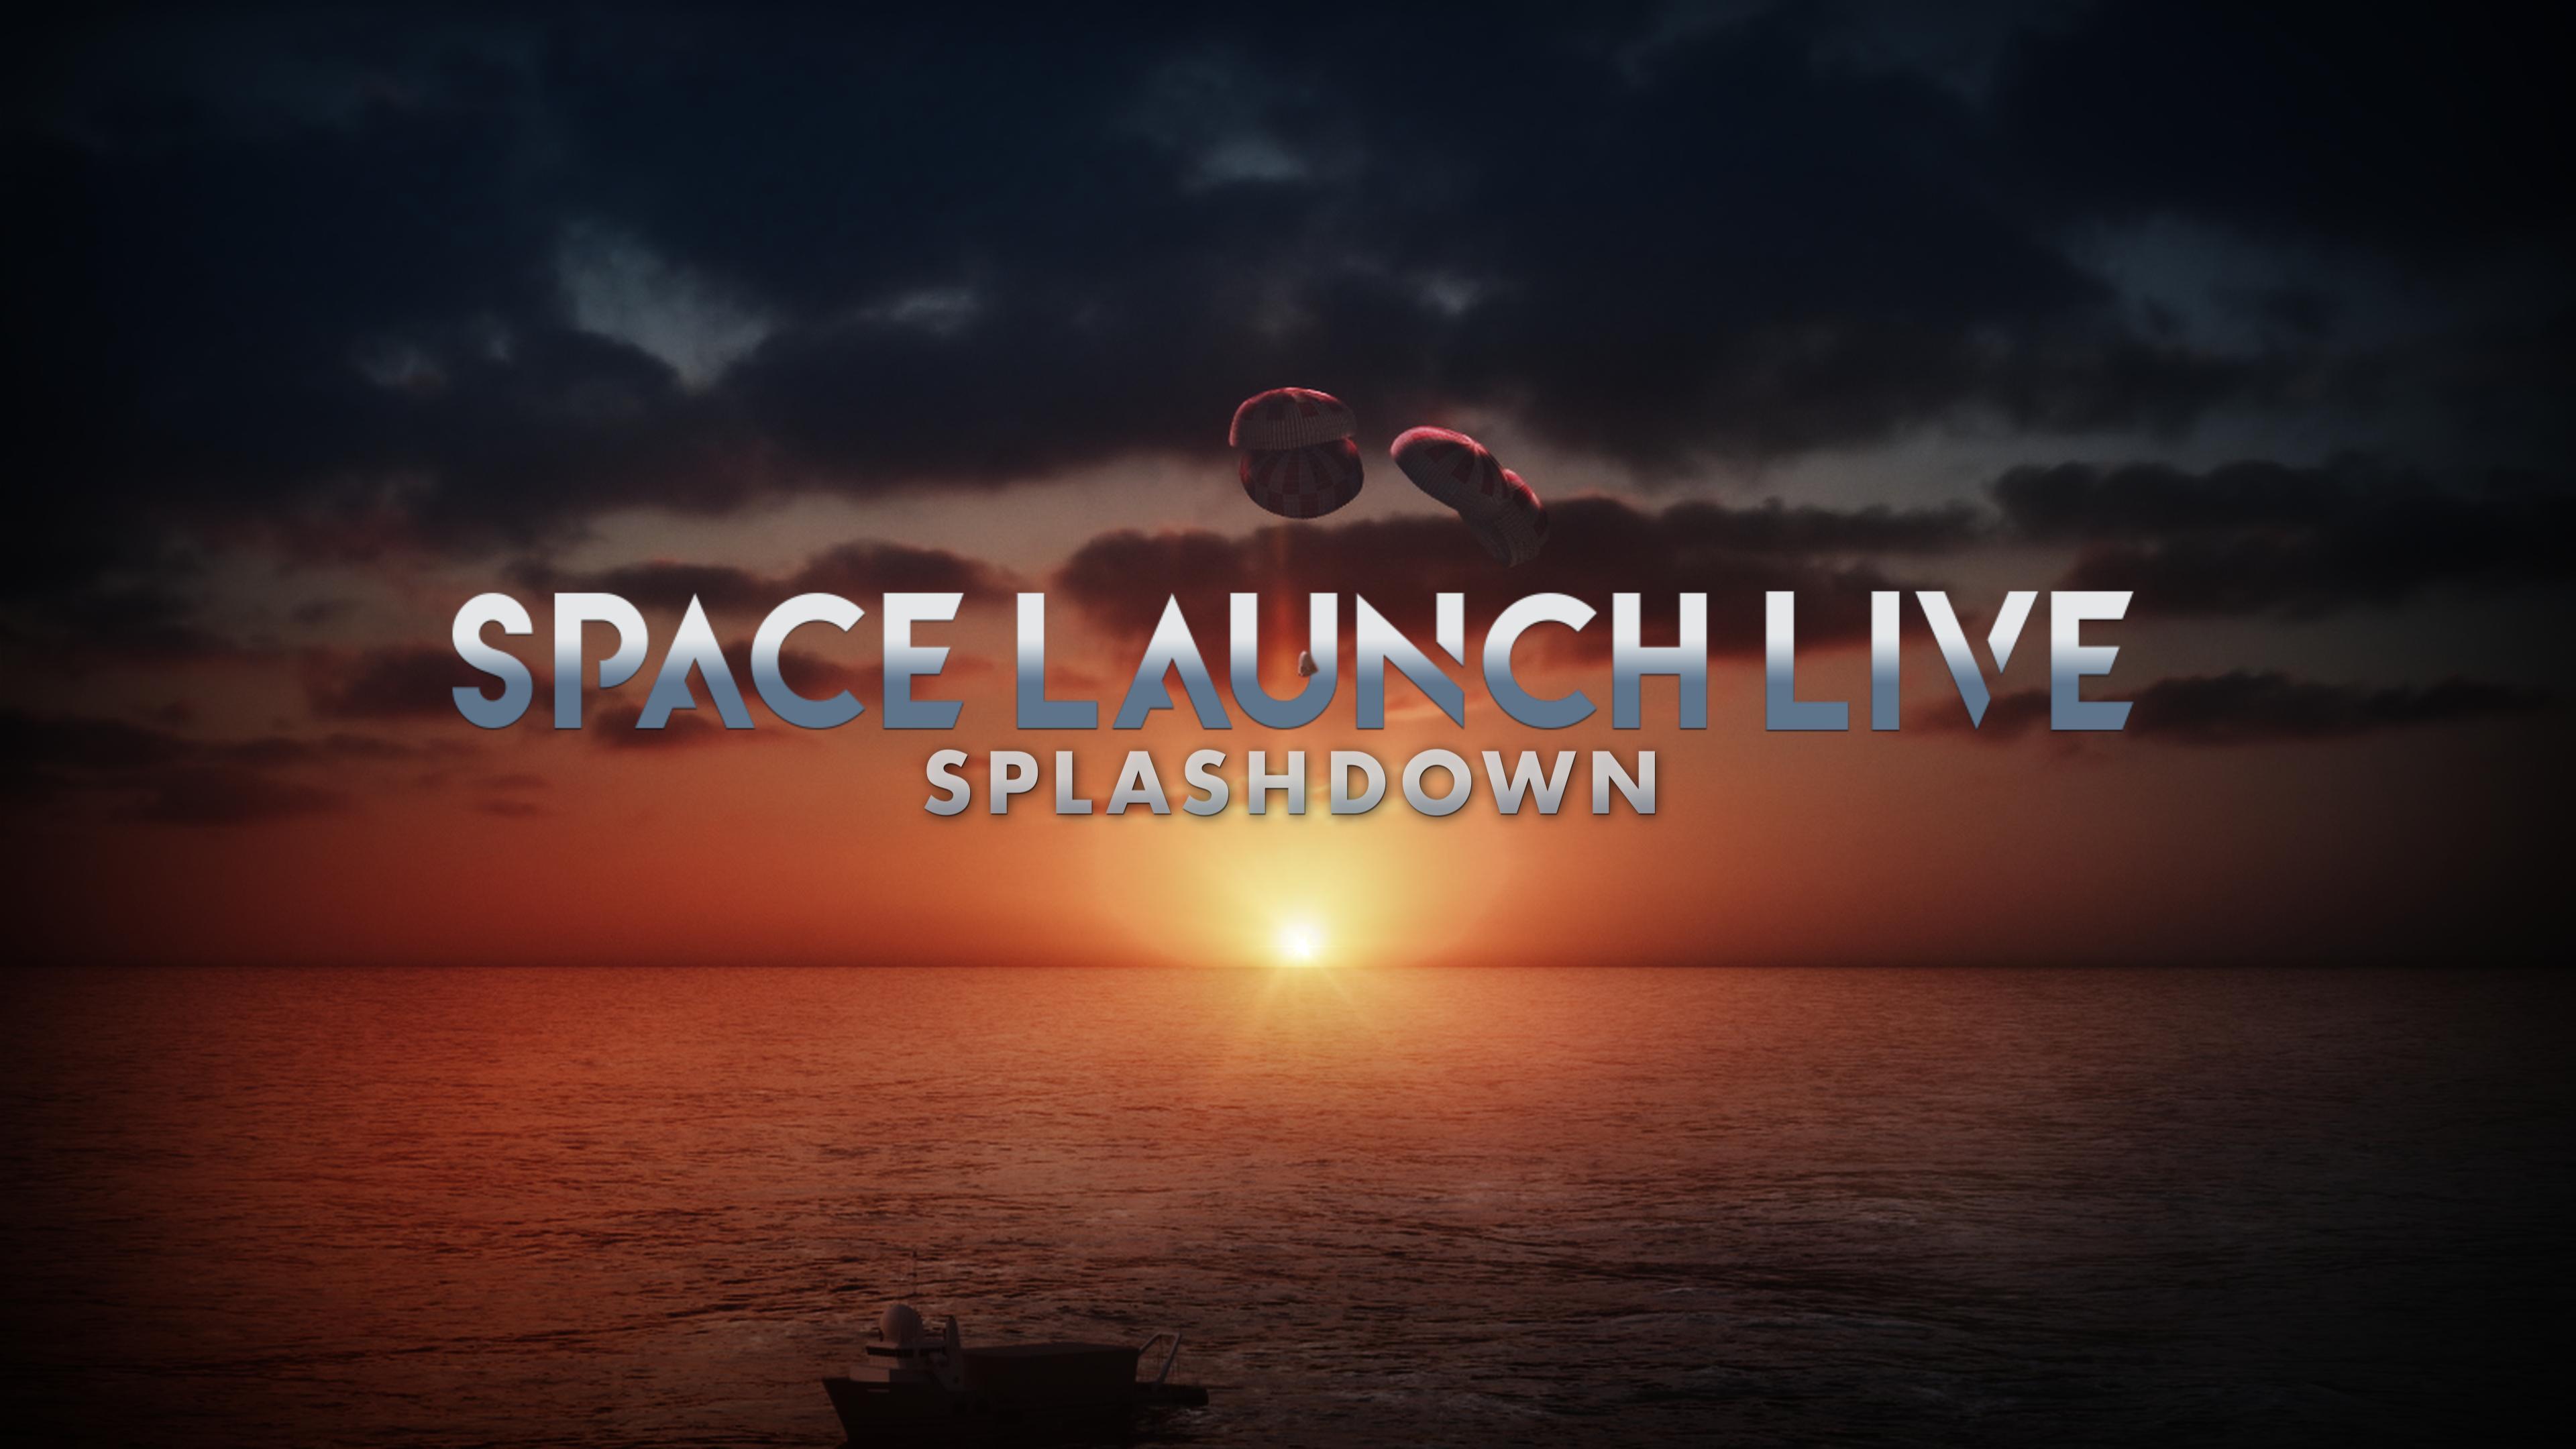 Space Launch Live: Splashdown hd on soap2day